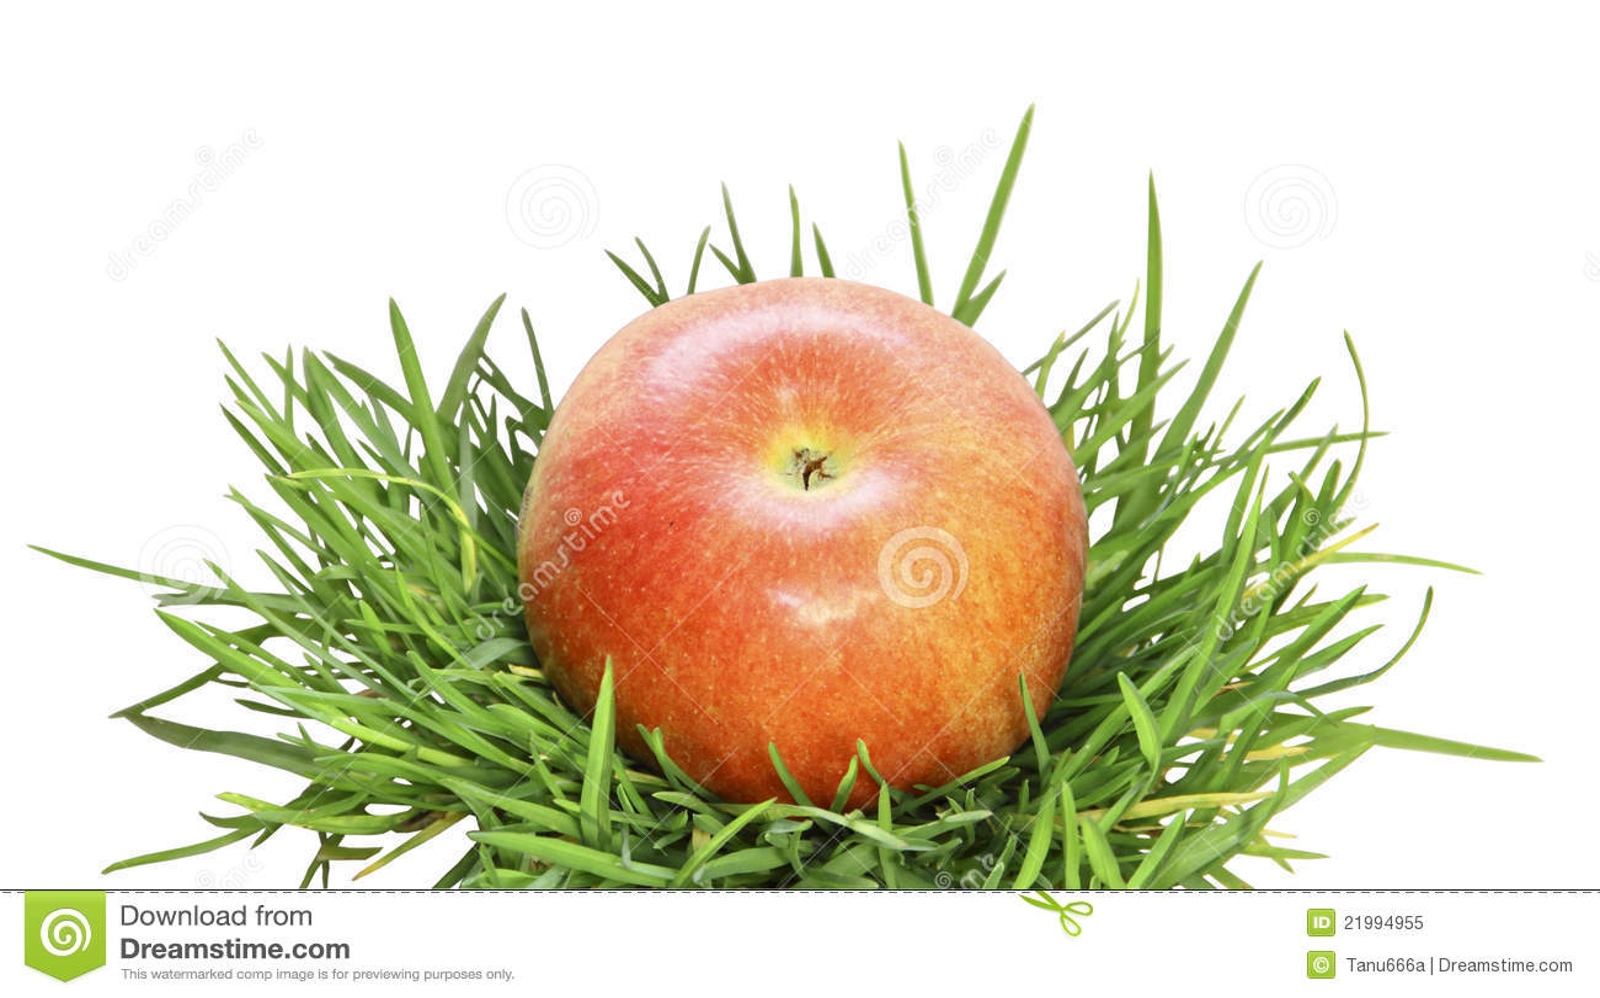 apple fruit background grass - photo #16